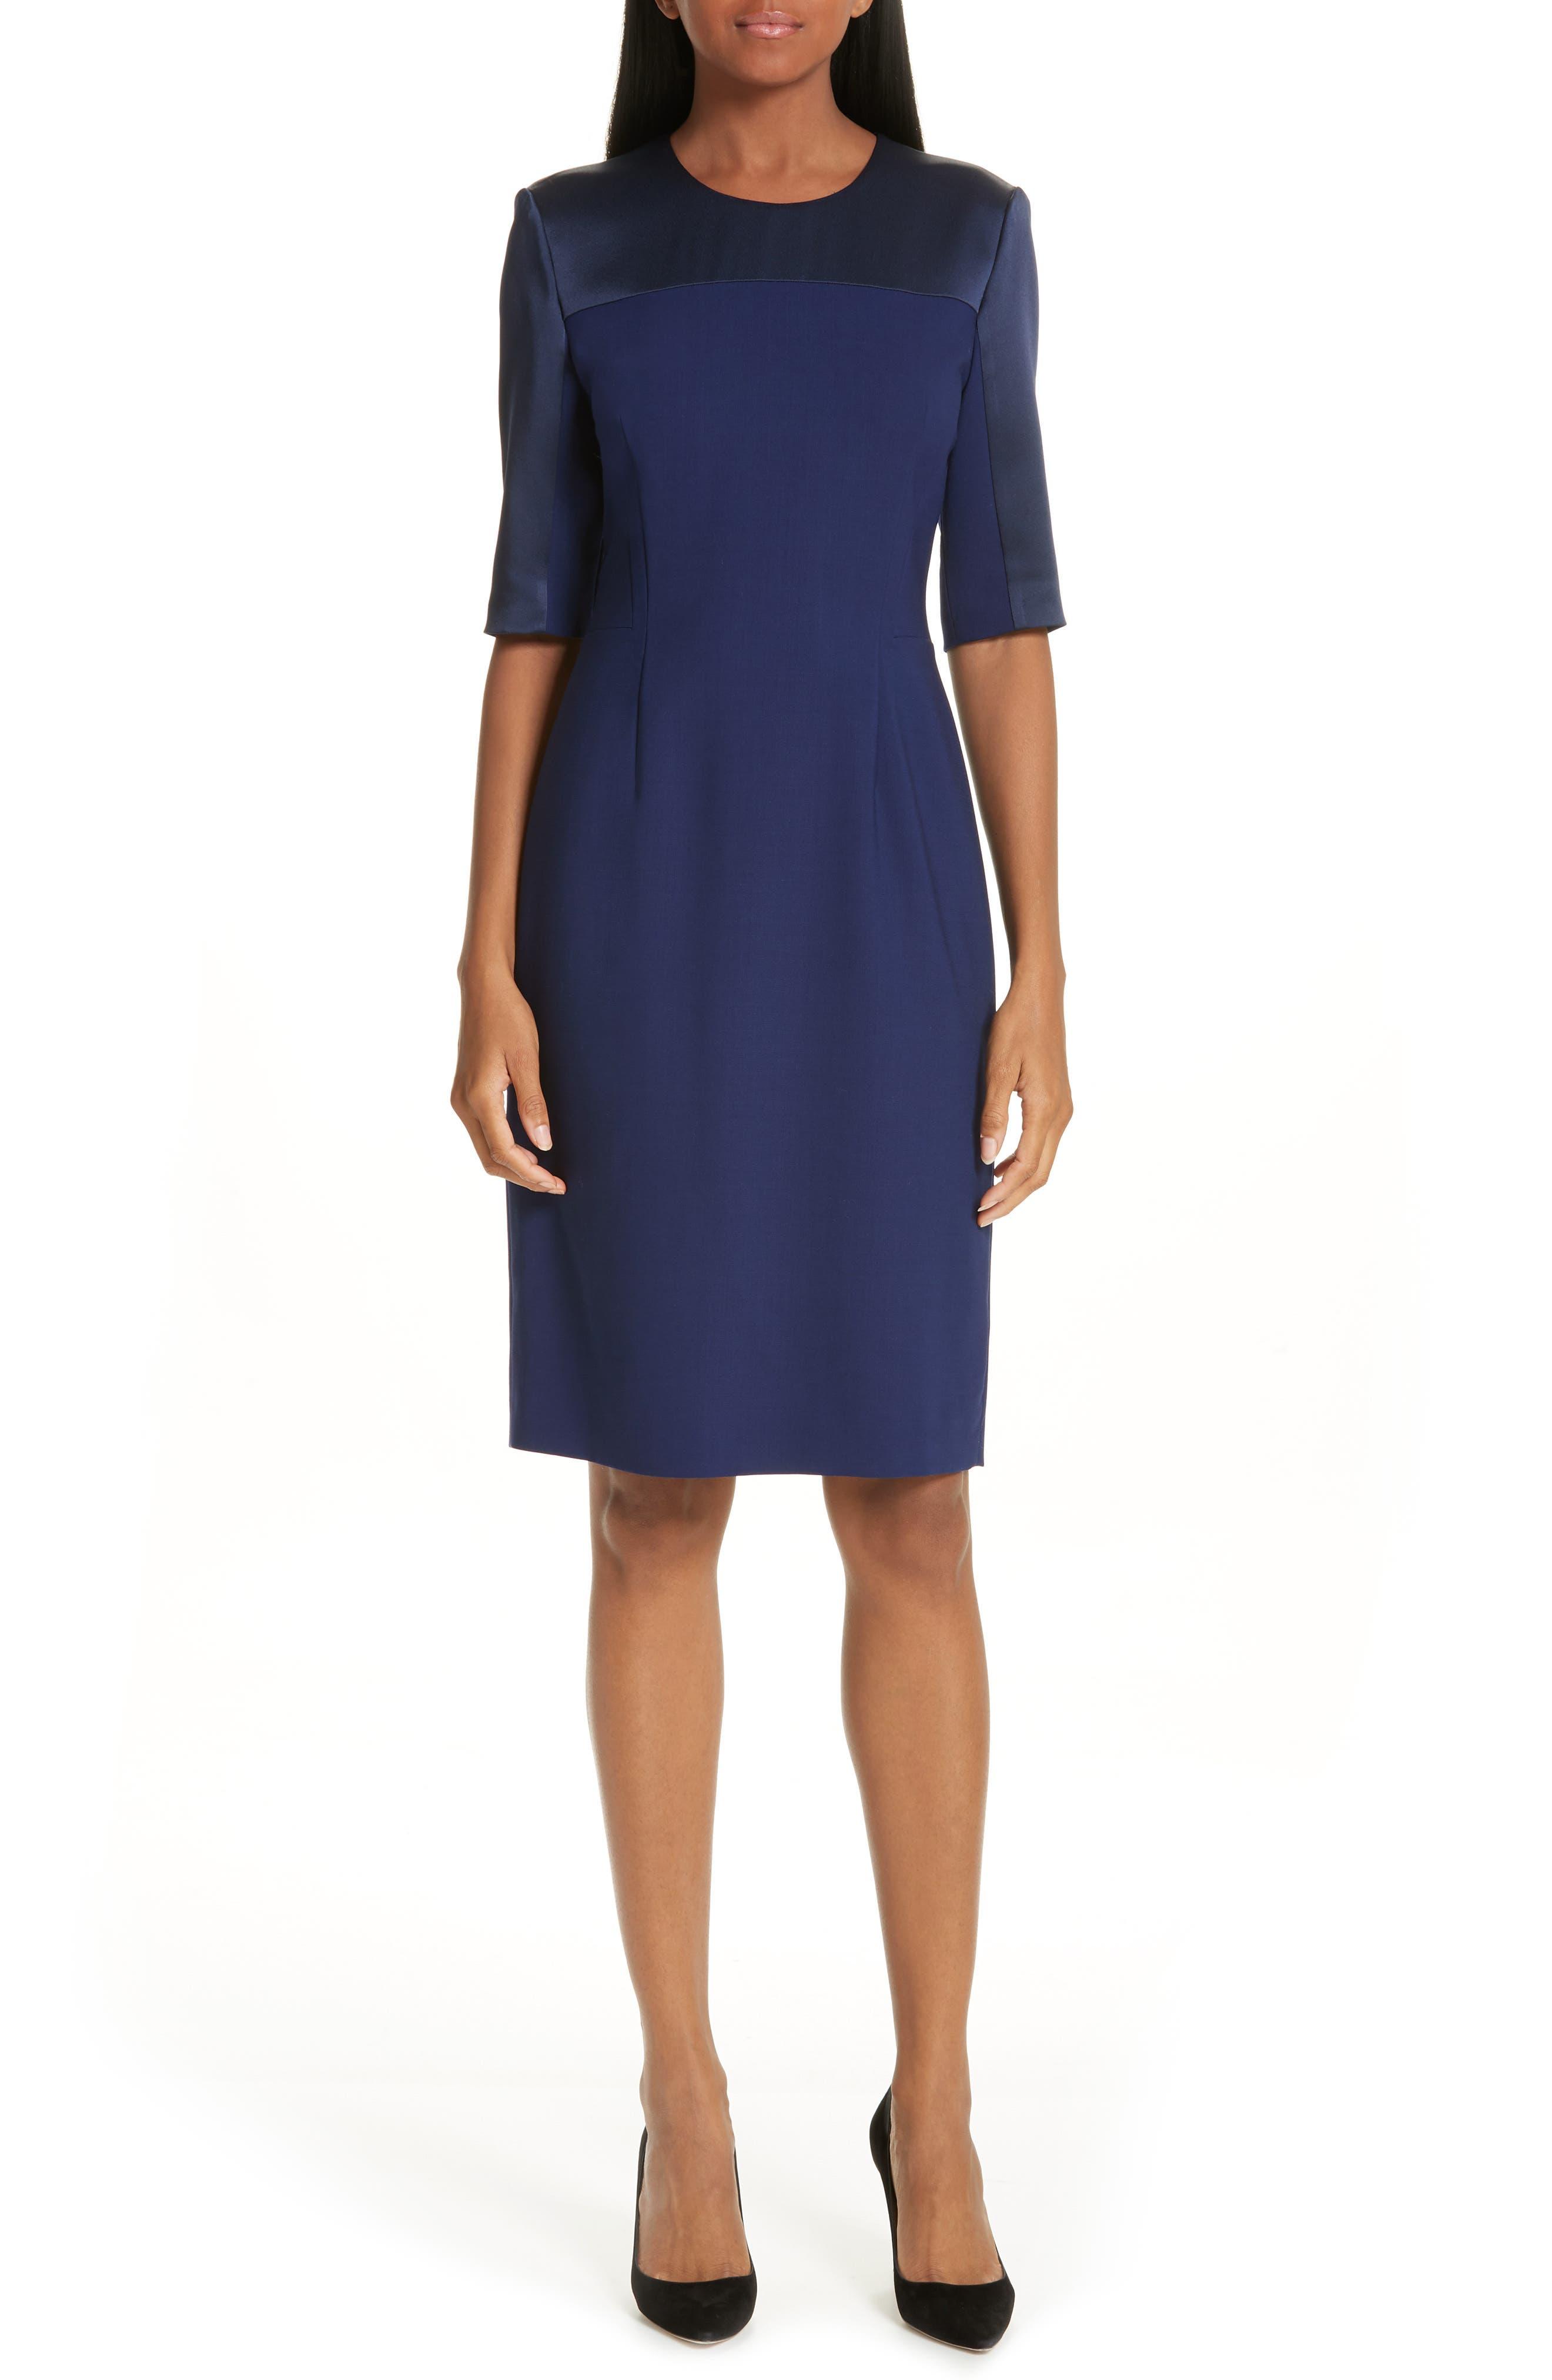 Danufa Stretch Wool Sheath Dress,                             Main thumbnail 1, color,                             INK BLUE